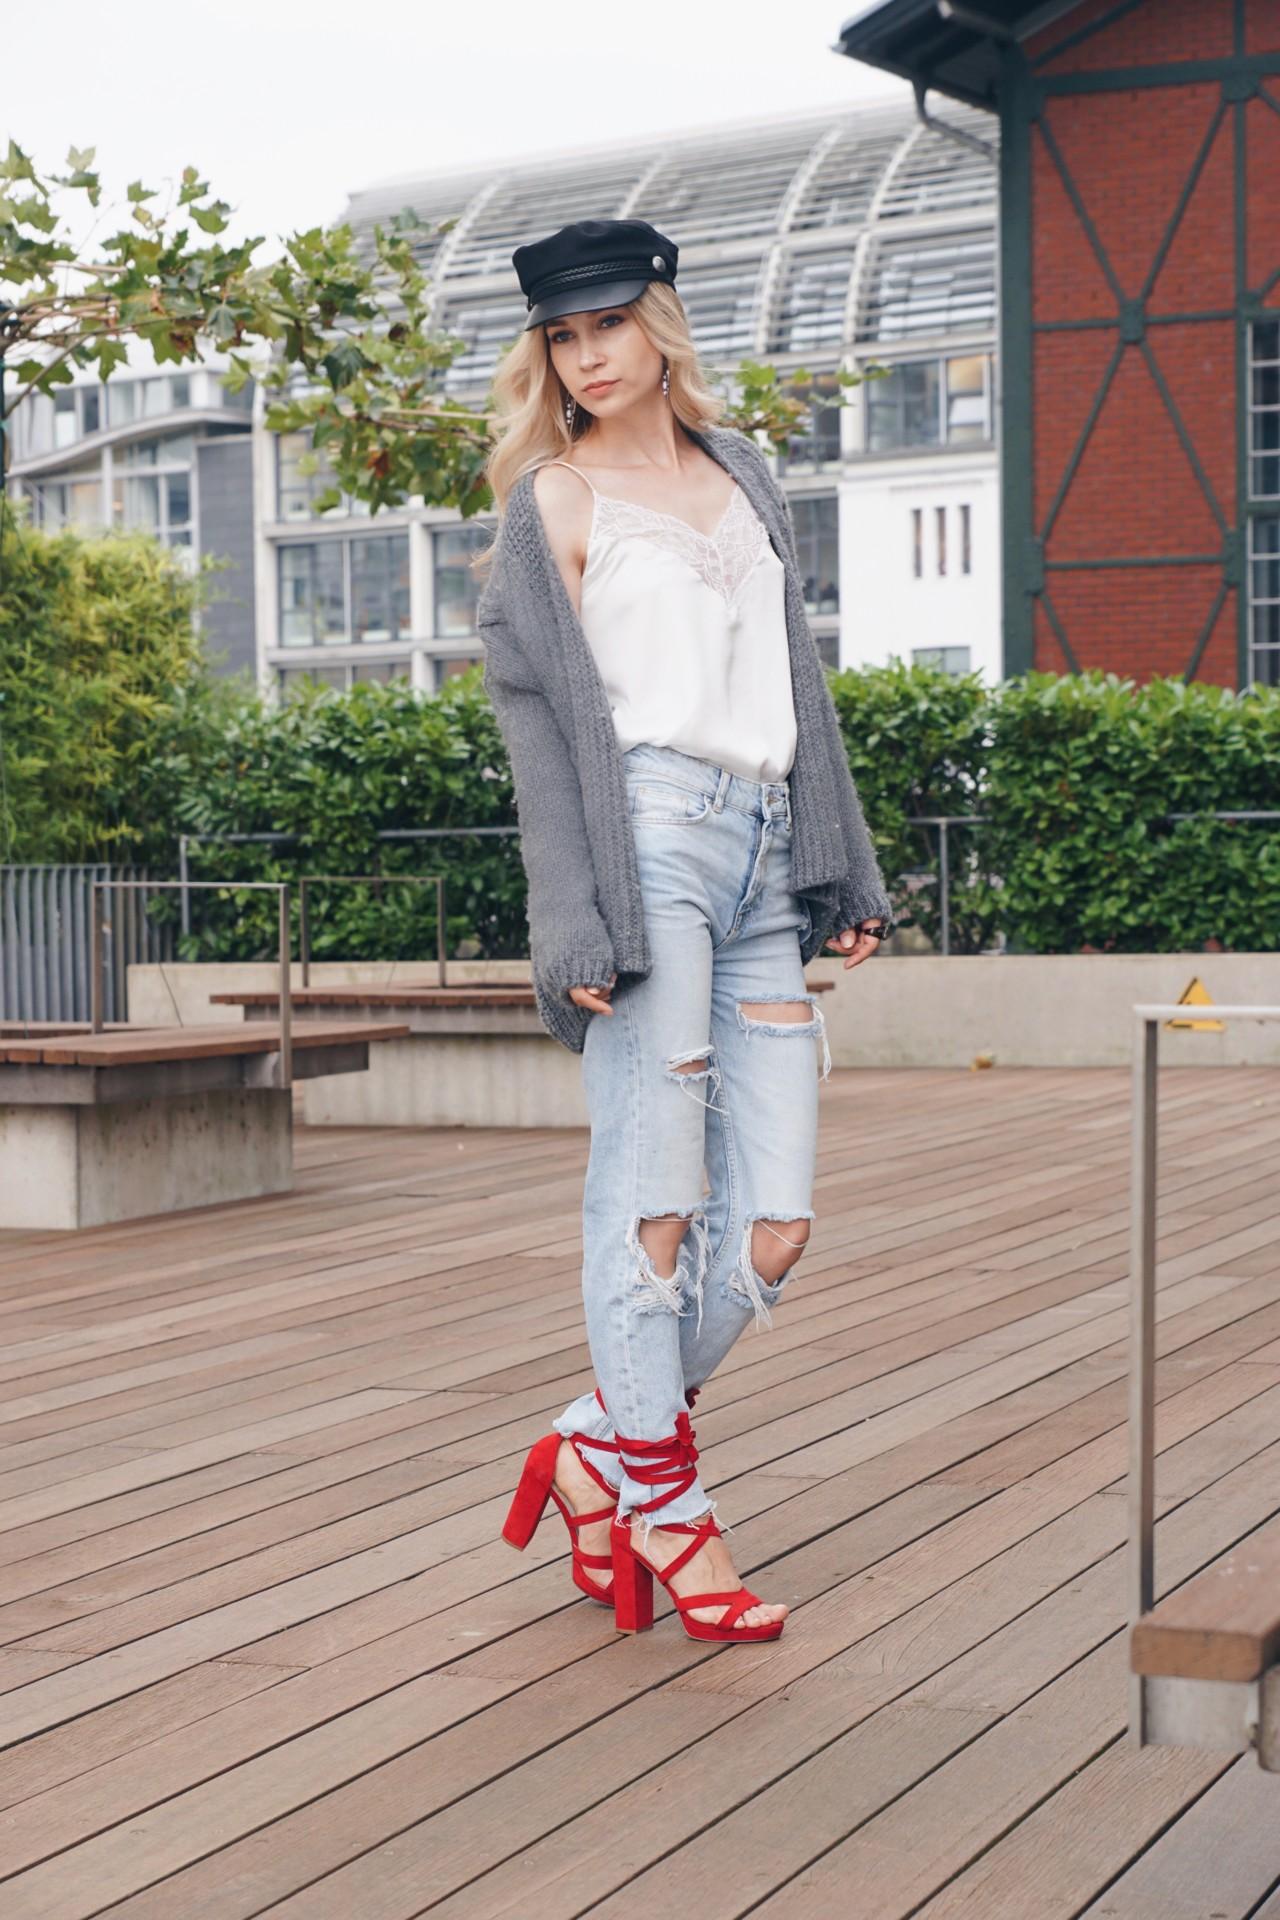 streetstyle_dbkstylez_fashion_falltrends_knit_baker_boy_cap_мода_стиль_фэшн